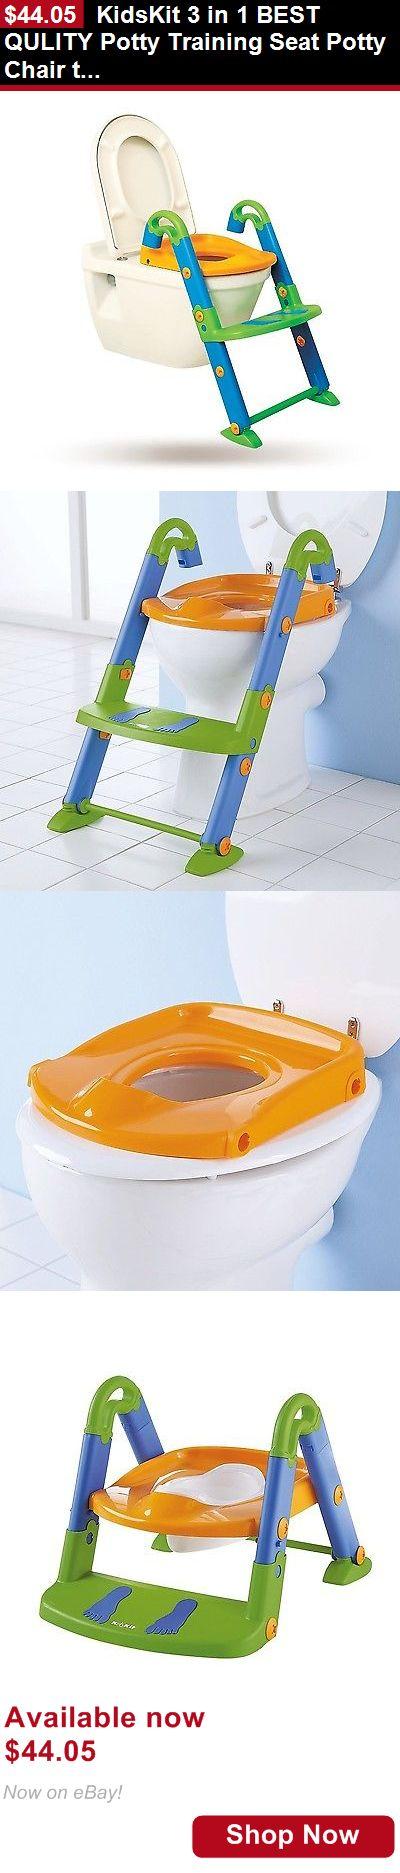 Potty Training: Kidskit 3 In 1 Best Qulity Potty Training Seat Potty Chair Training Toilet Seat BUY IT NOW ONLY: $44.05